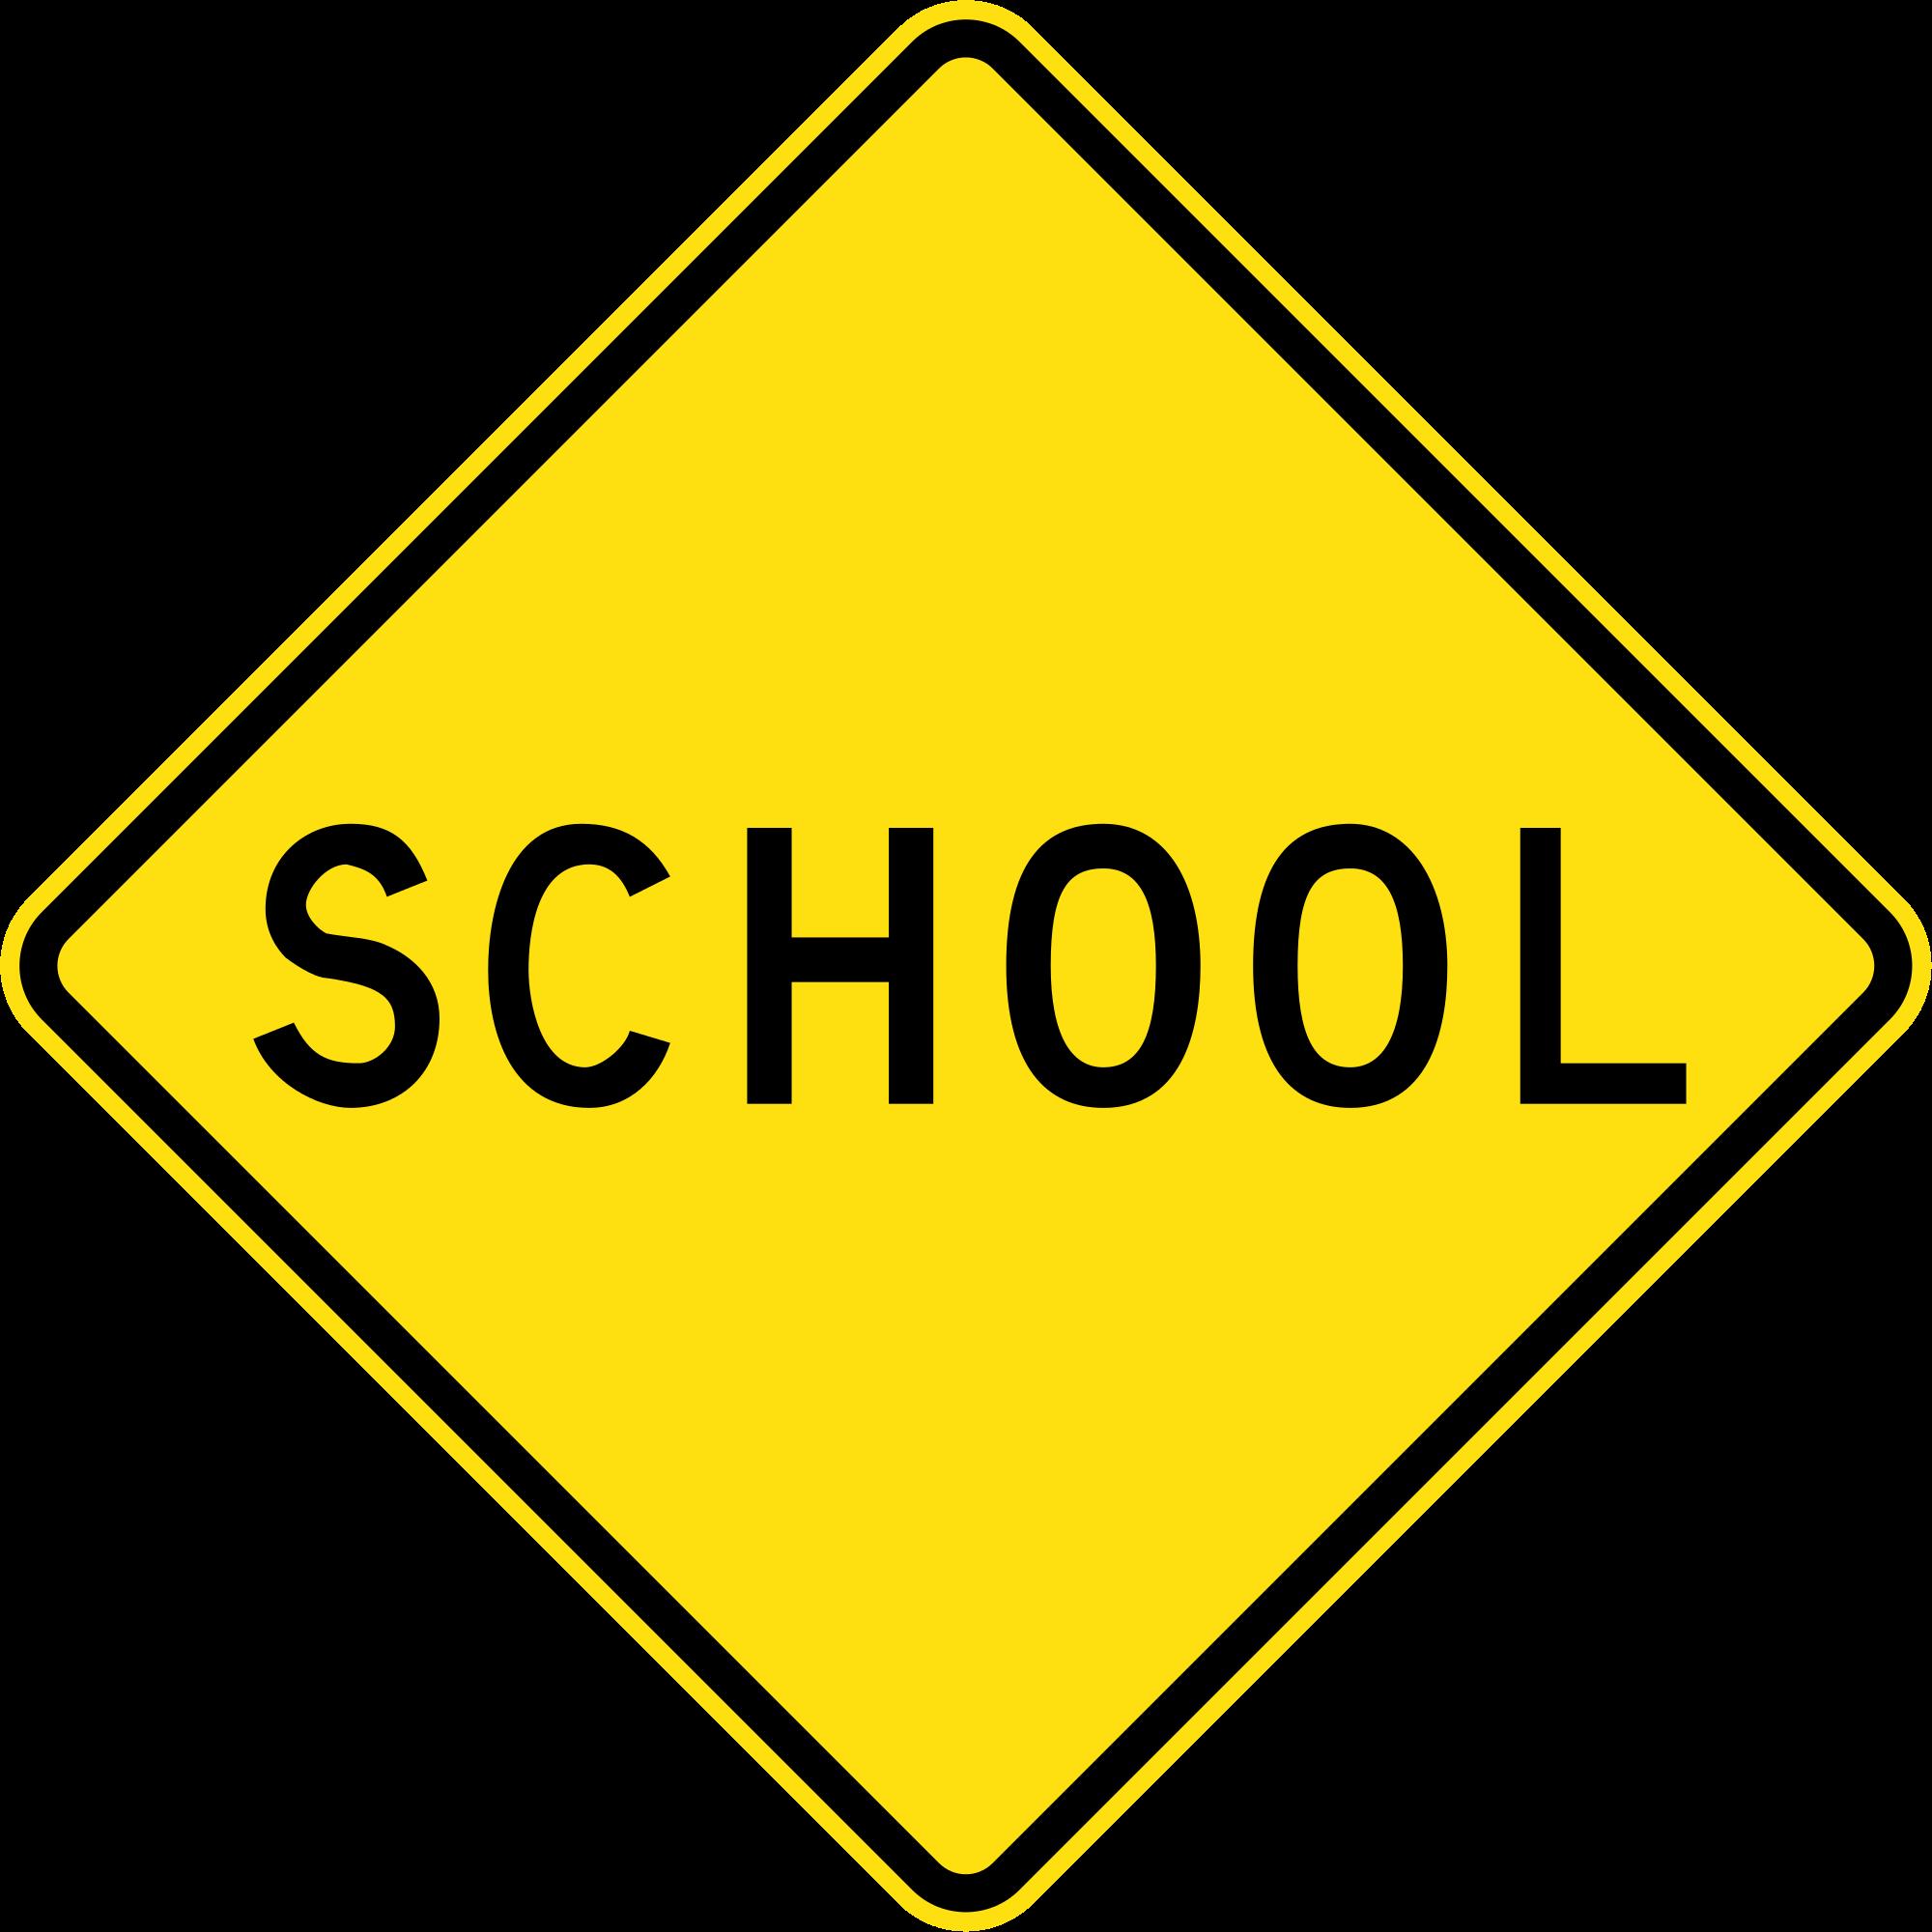 Road Sign HD PNG - 90986